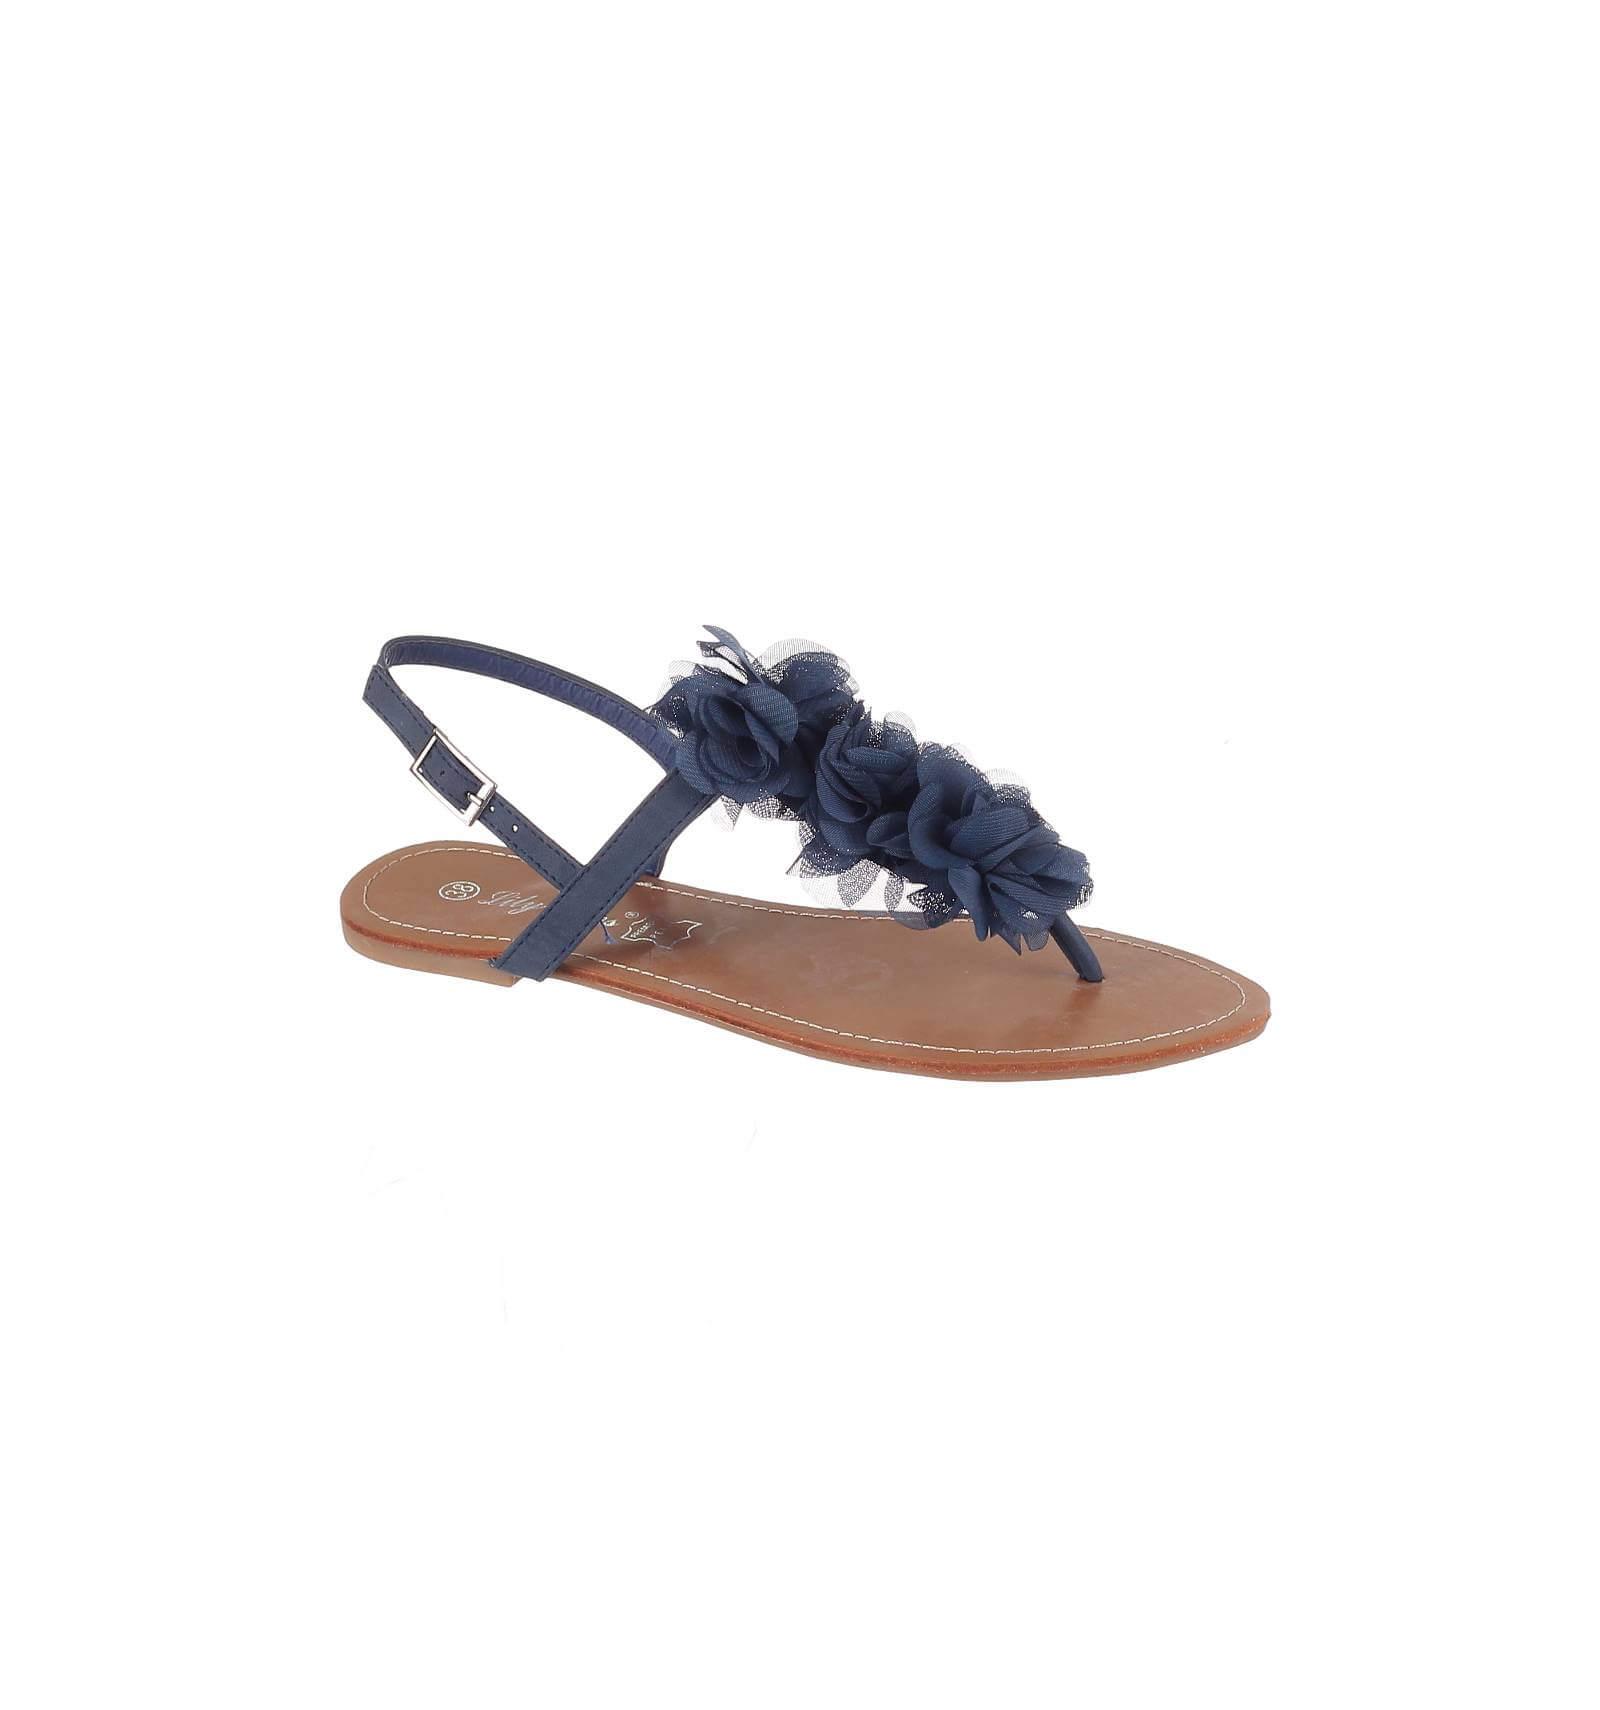 47b033e2566 Sandale femme simili cuir plate à fleur corail MALAGA. Elegance et ...